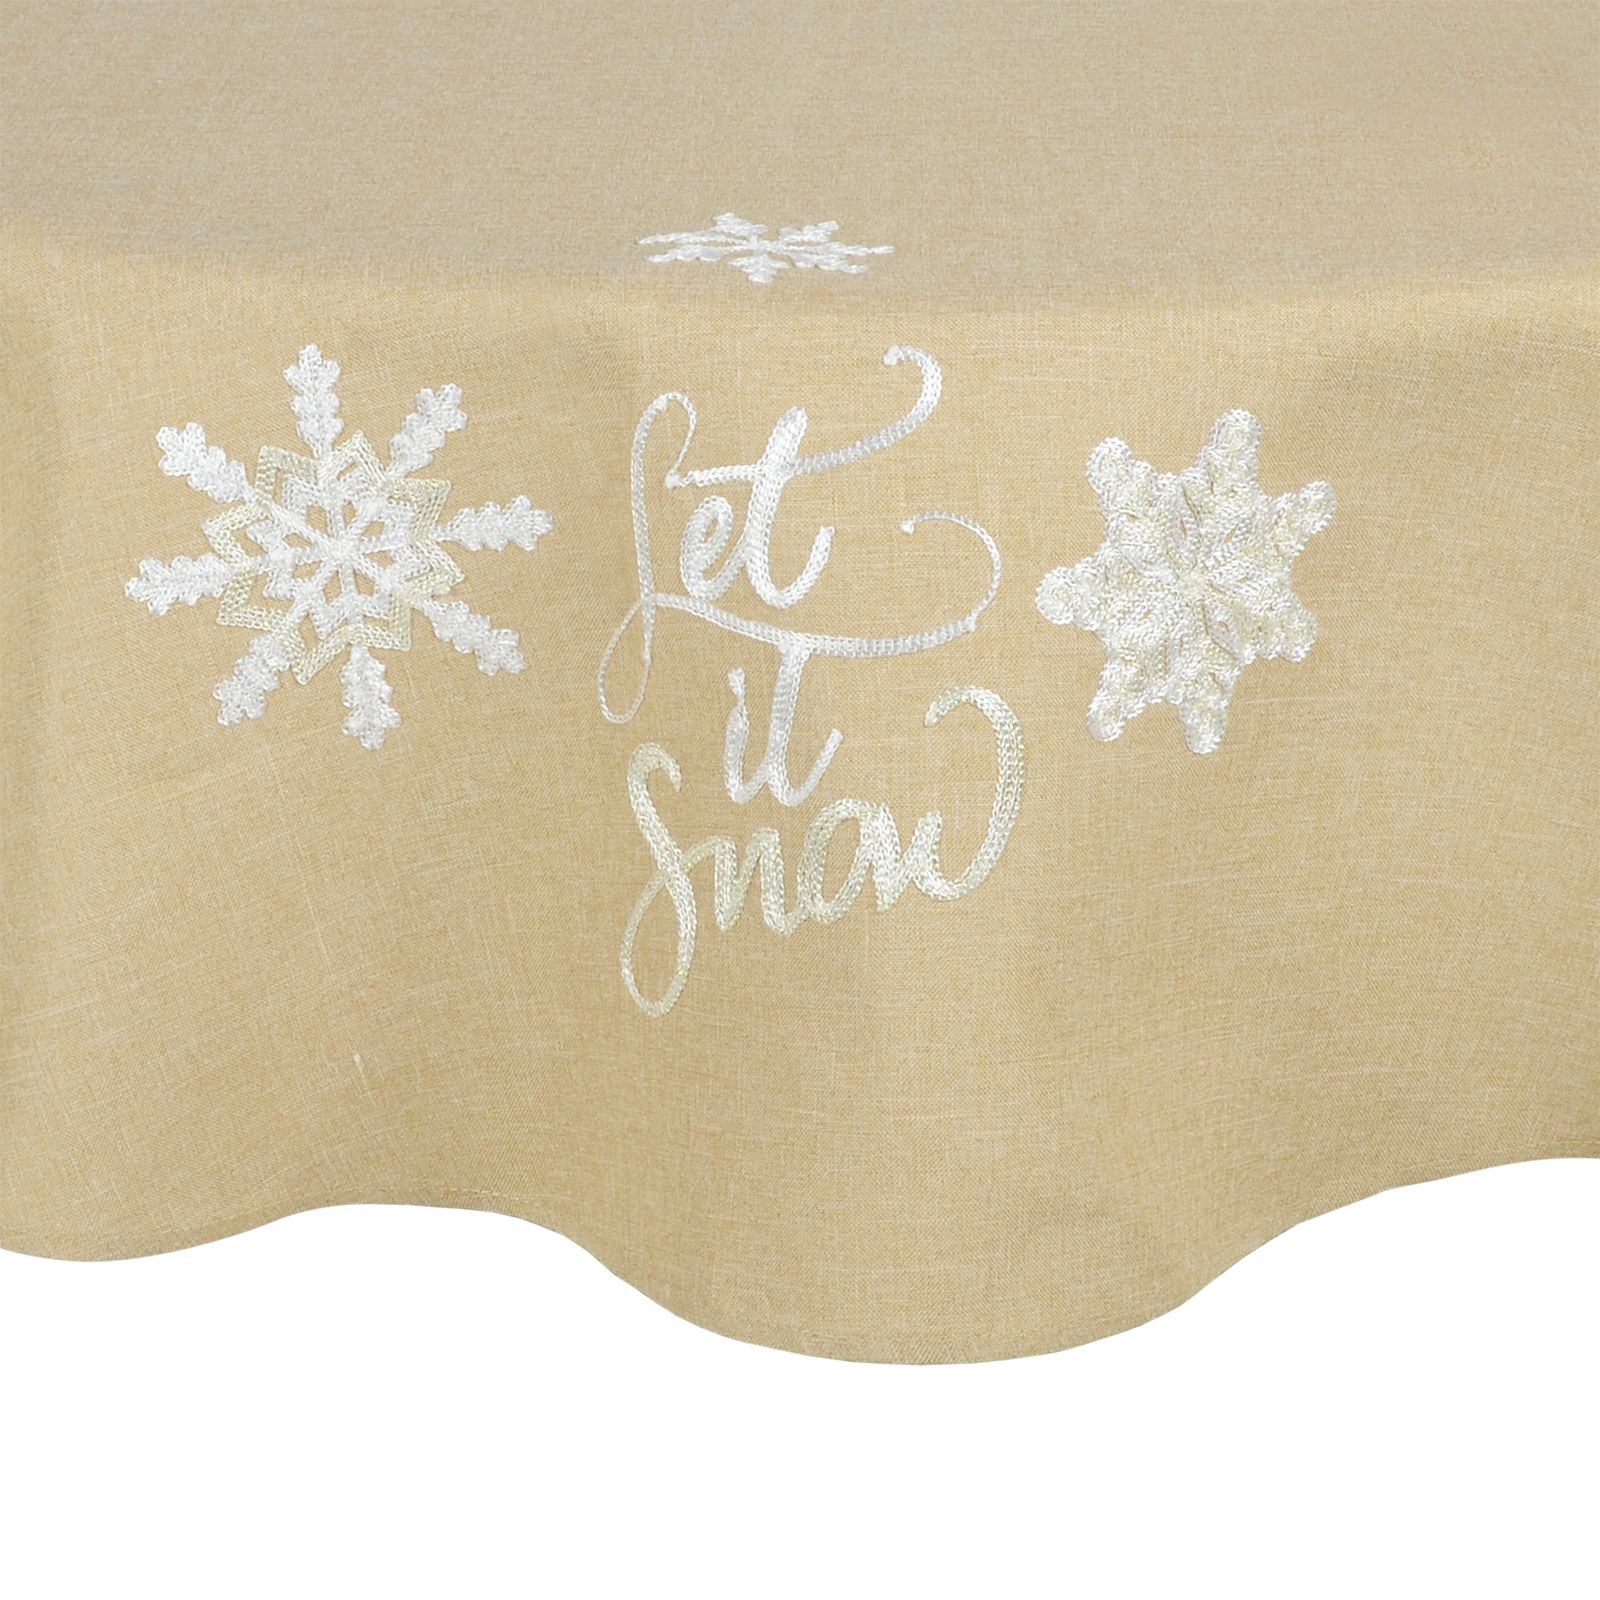 Christmas-Tablecloth-Festive-Pattern-Rectangle-Round-Fabric-Xmas-Room-Decoration Indexbild 102